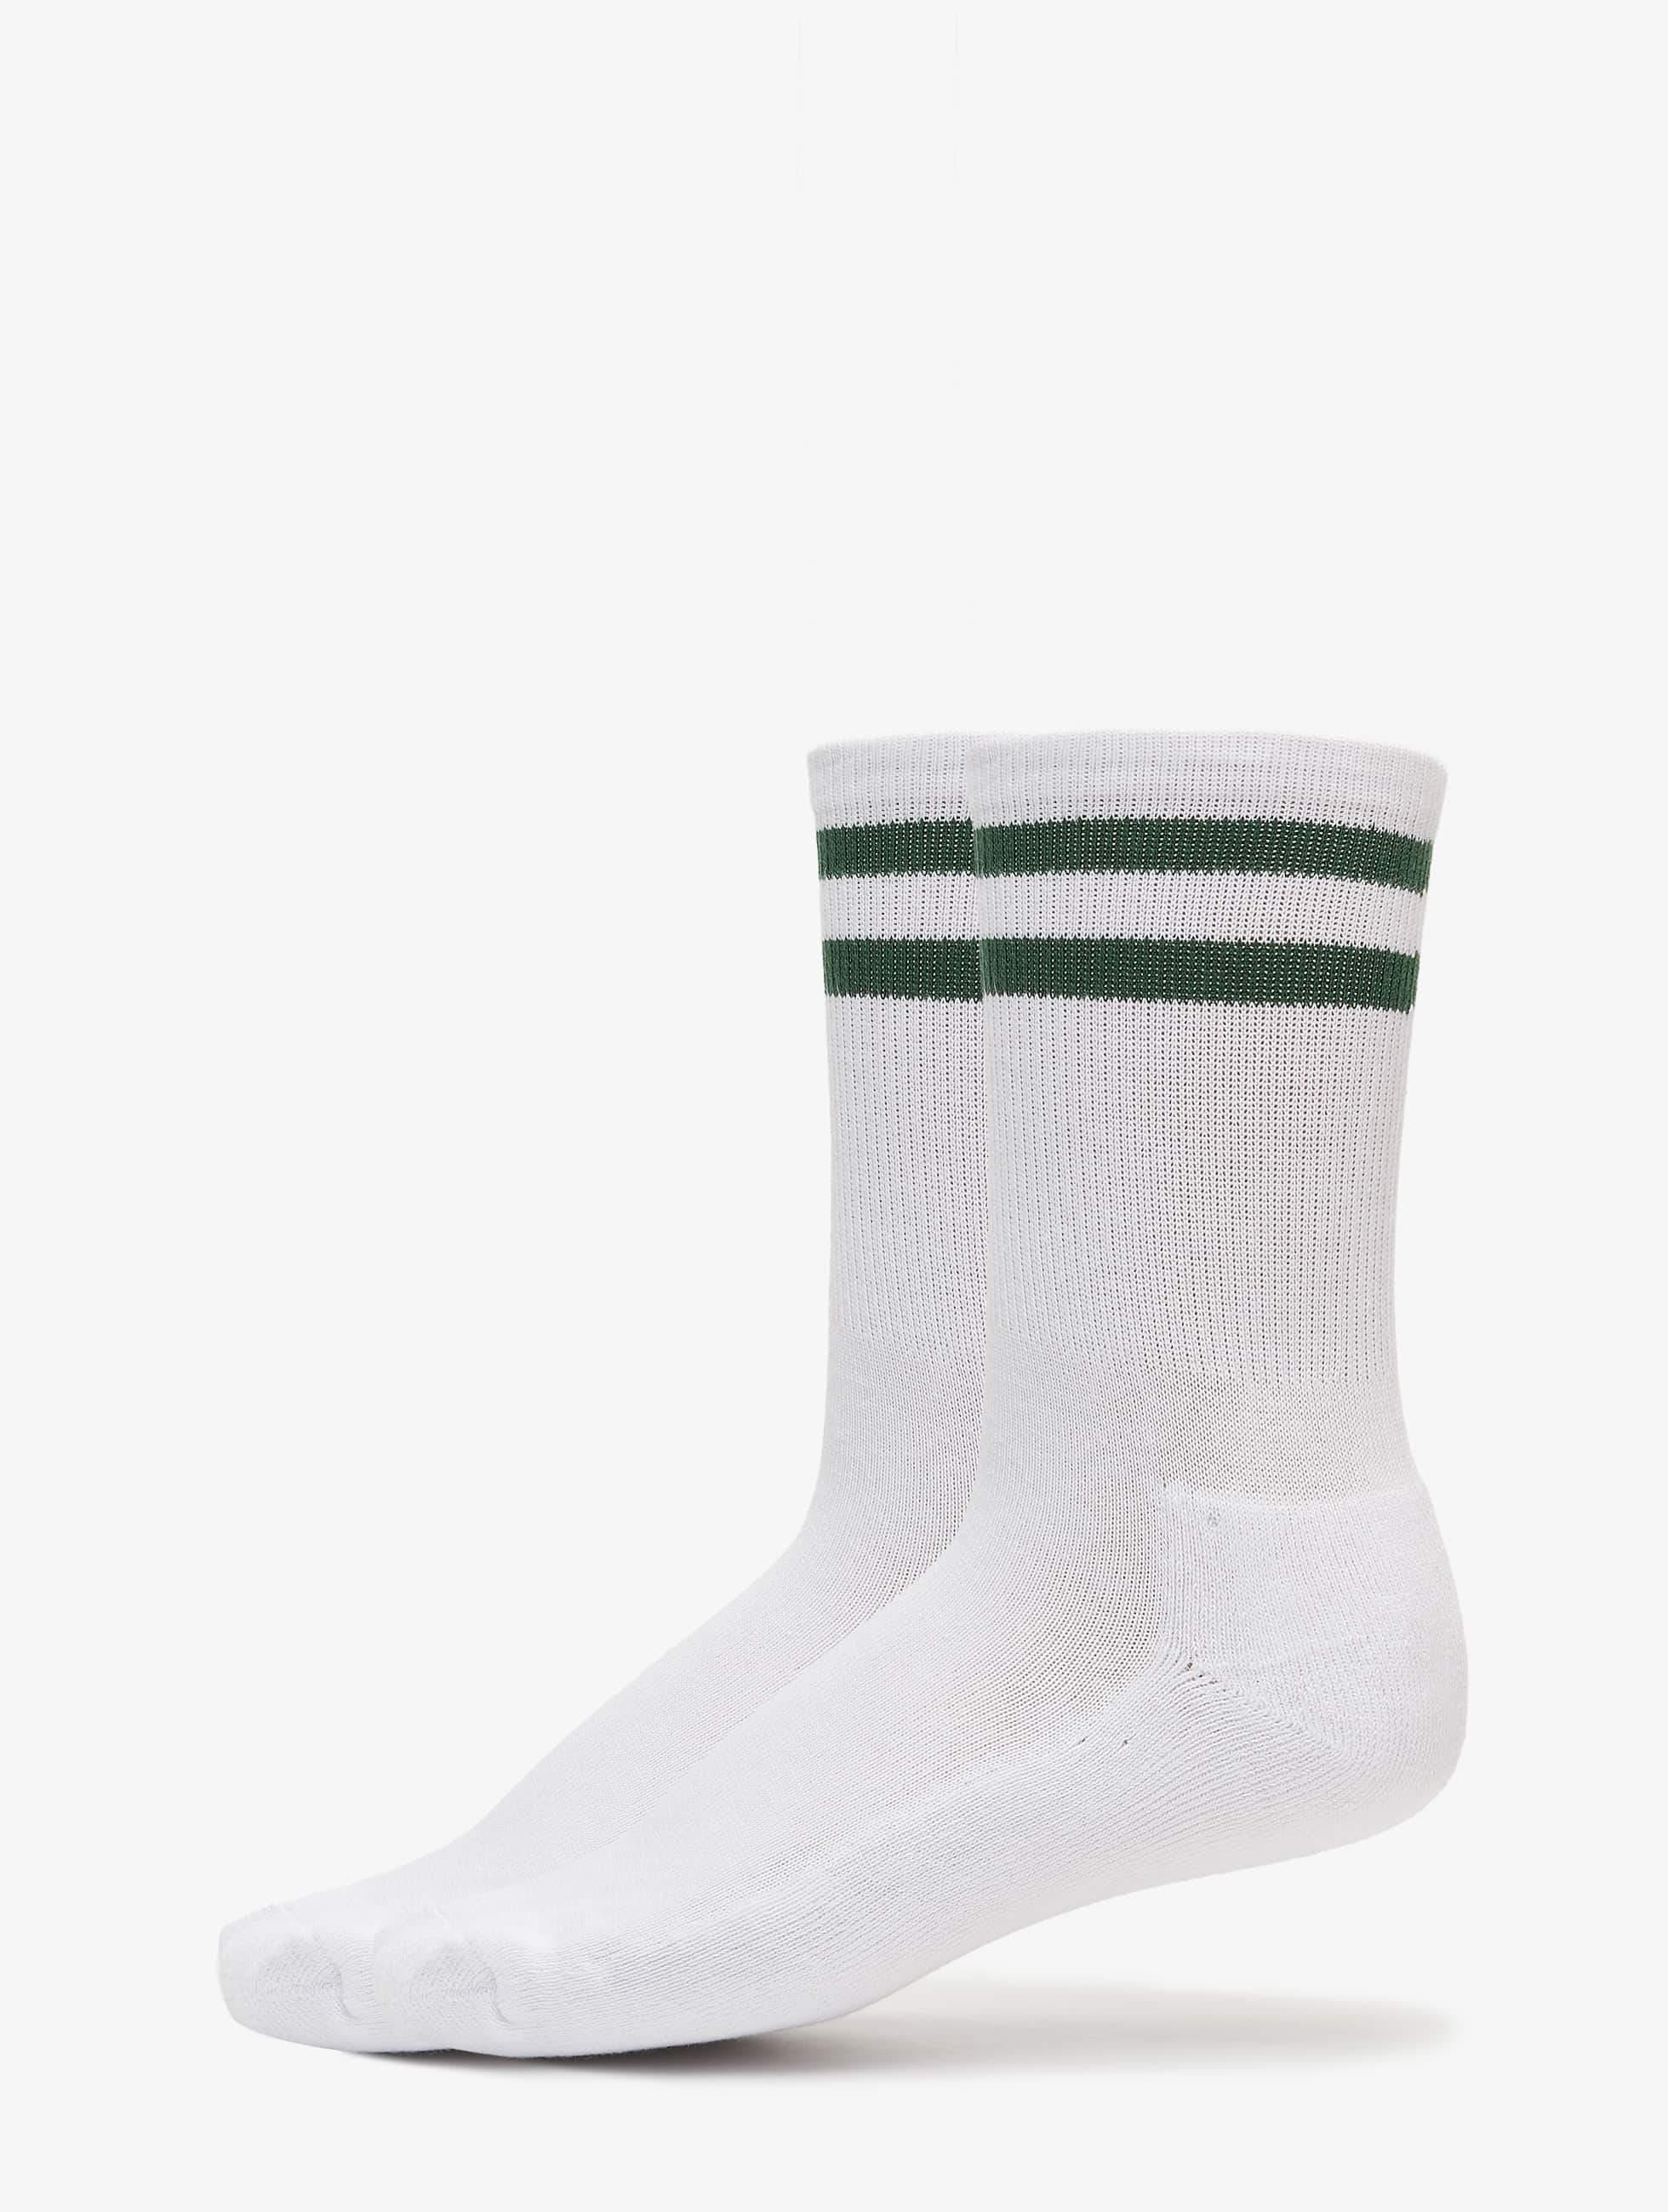 Strumpor White With Stripe | madlady.se